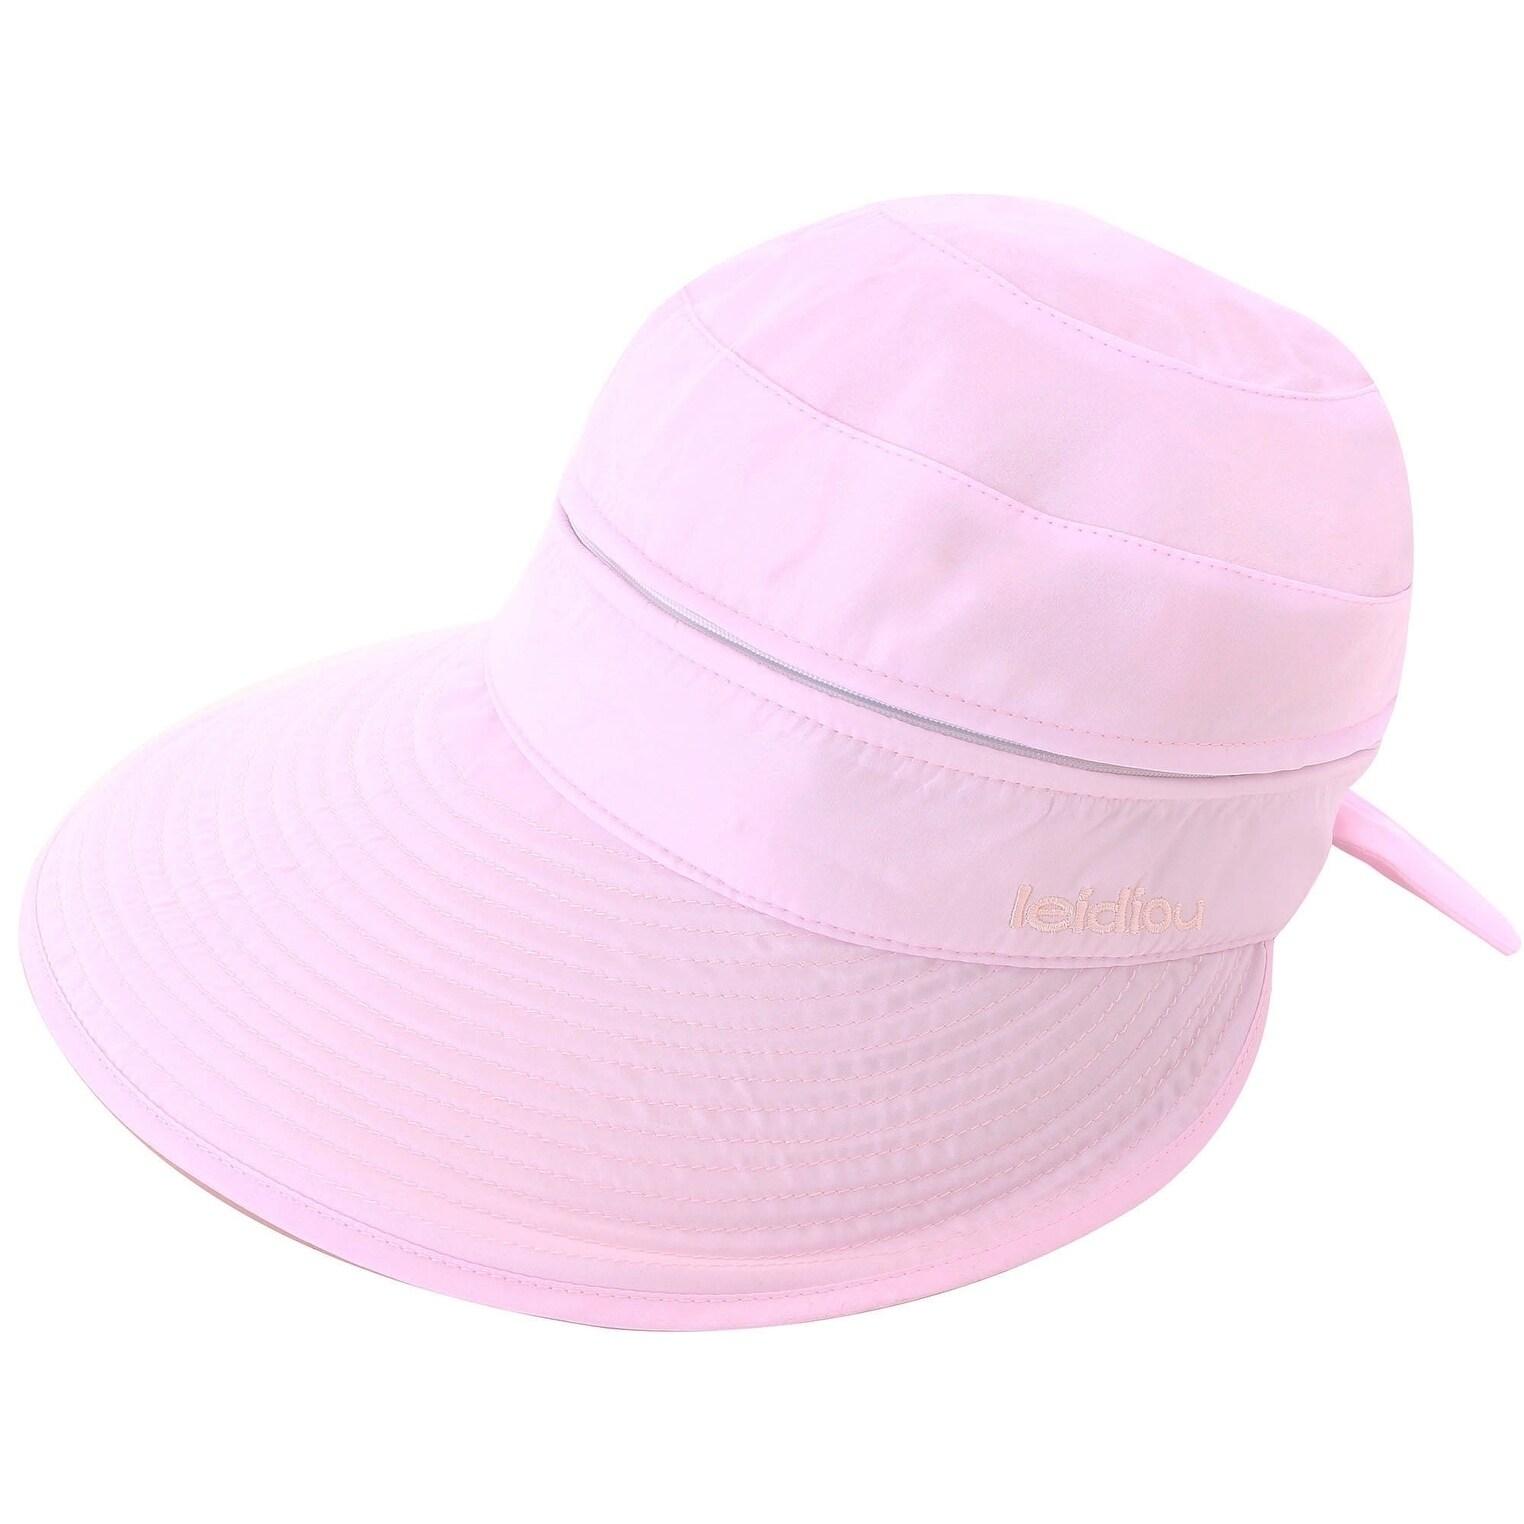 e48ab807b Women's UPF 50+ UV Sun Protective Convertible Beach Hat Visor